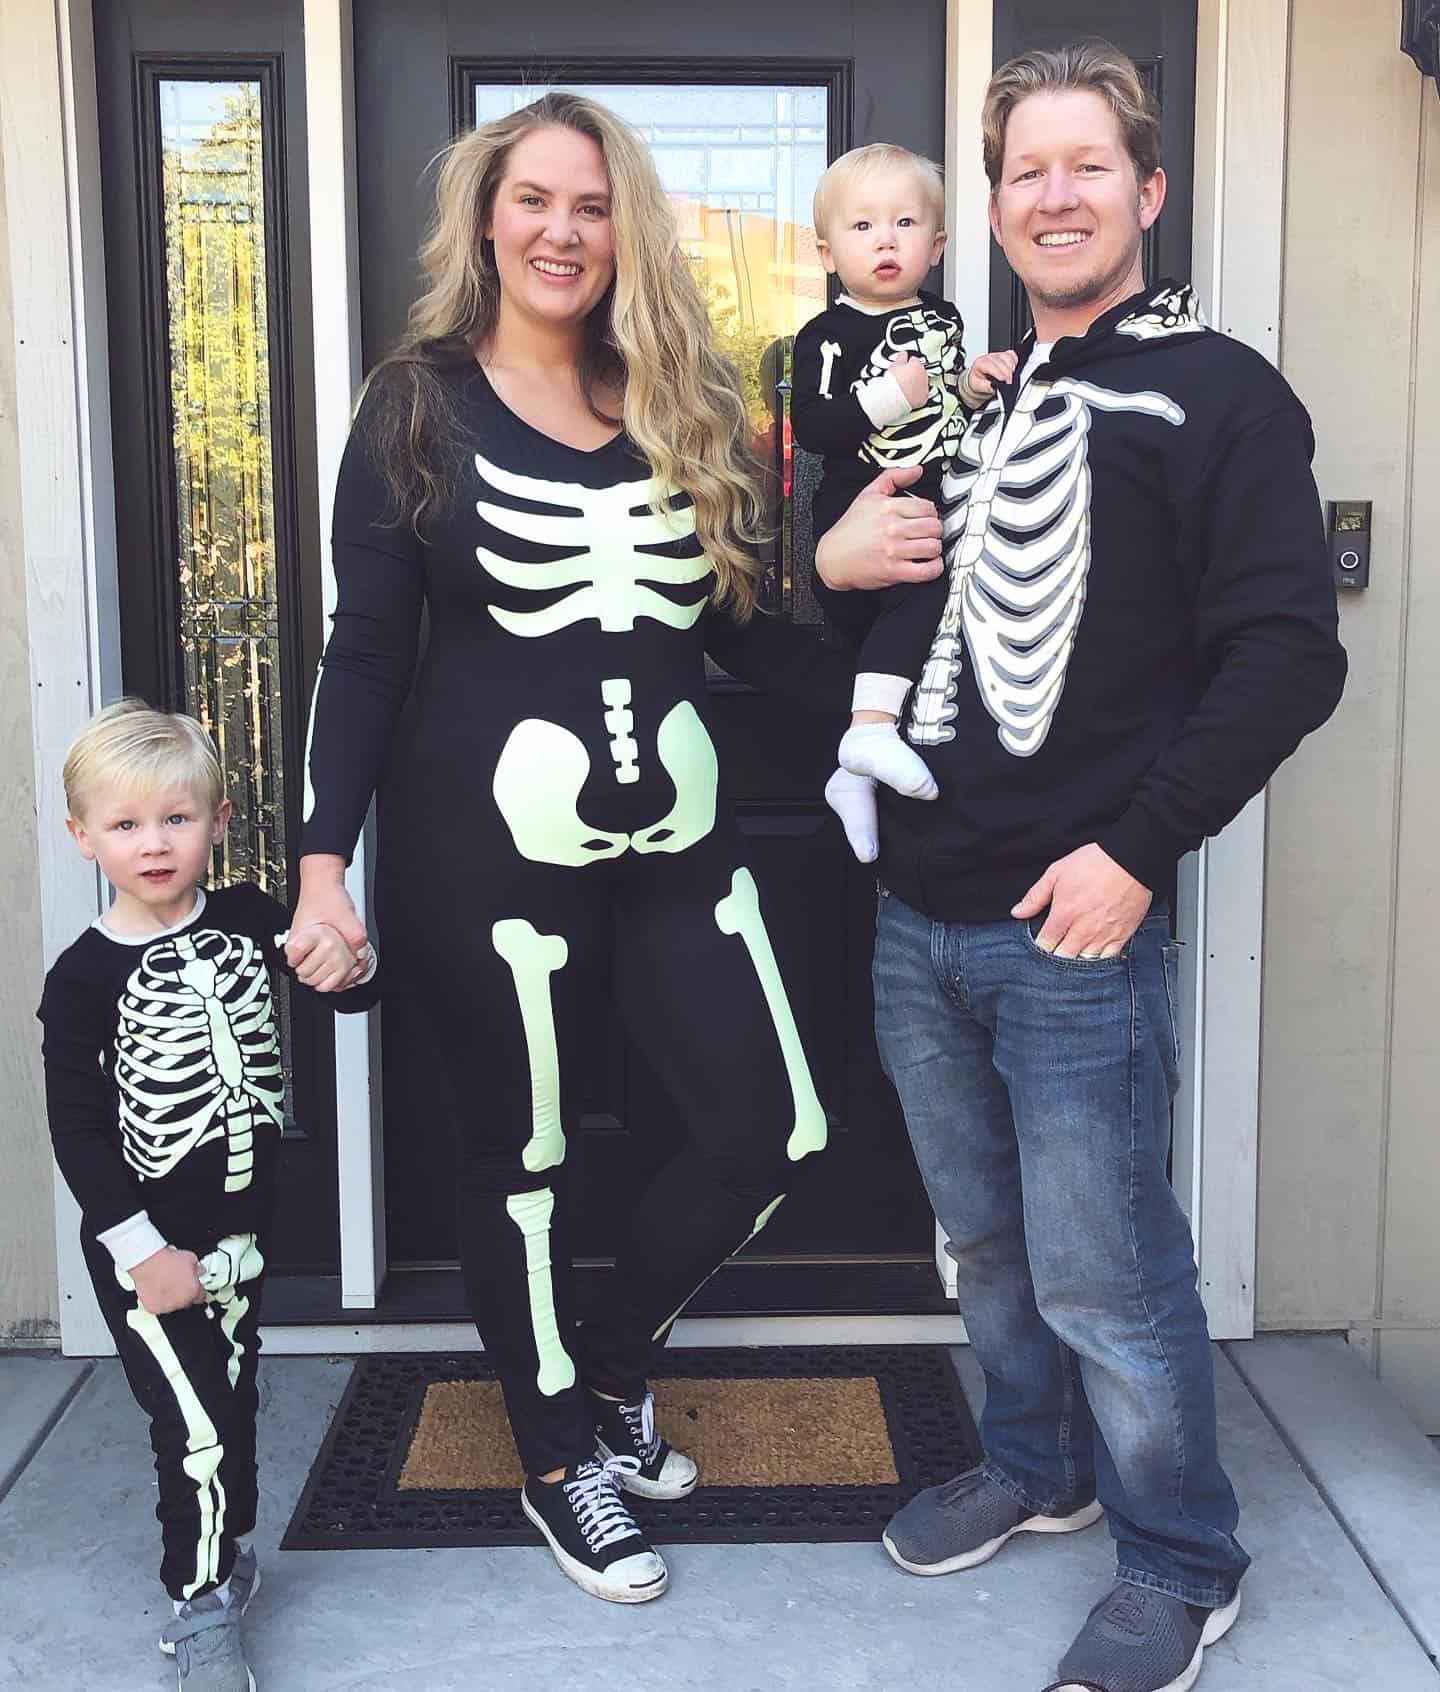 Skeleton family halloween costume